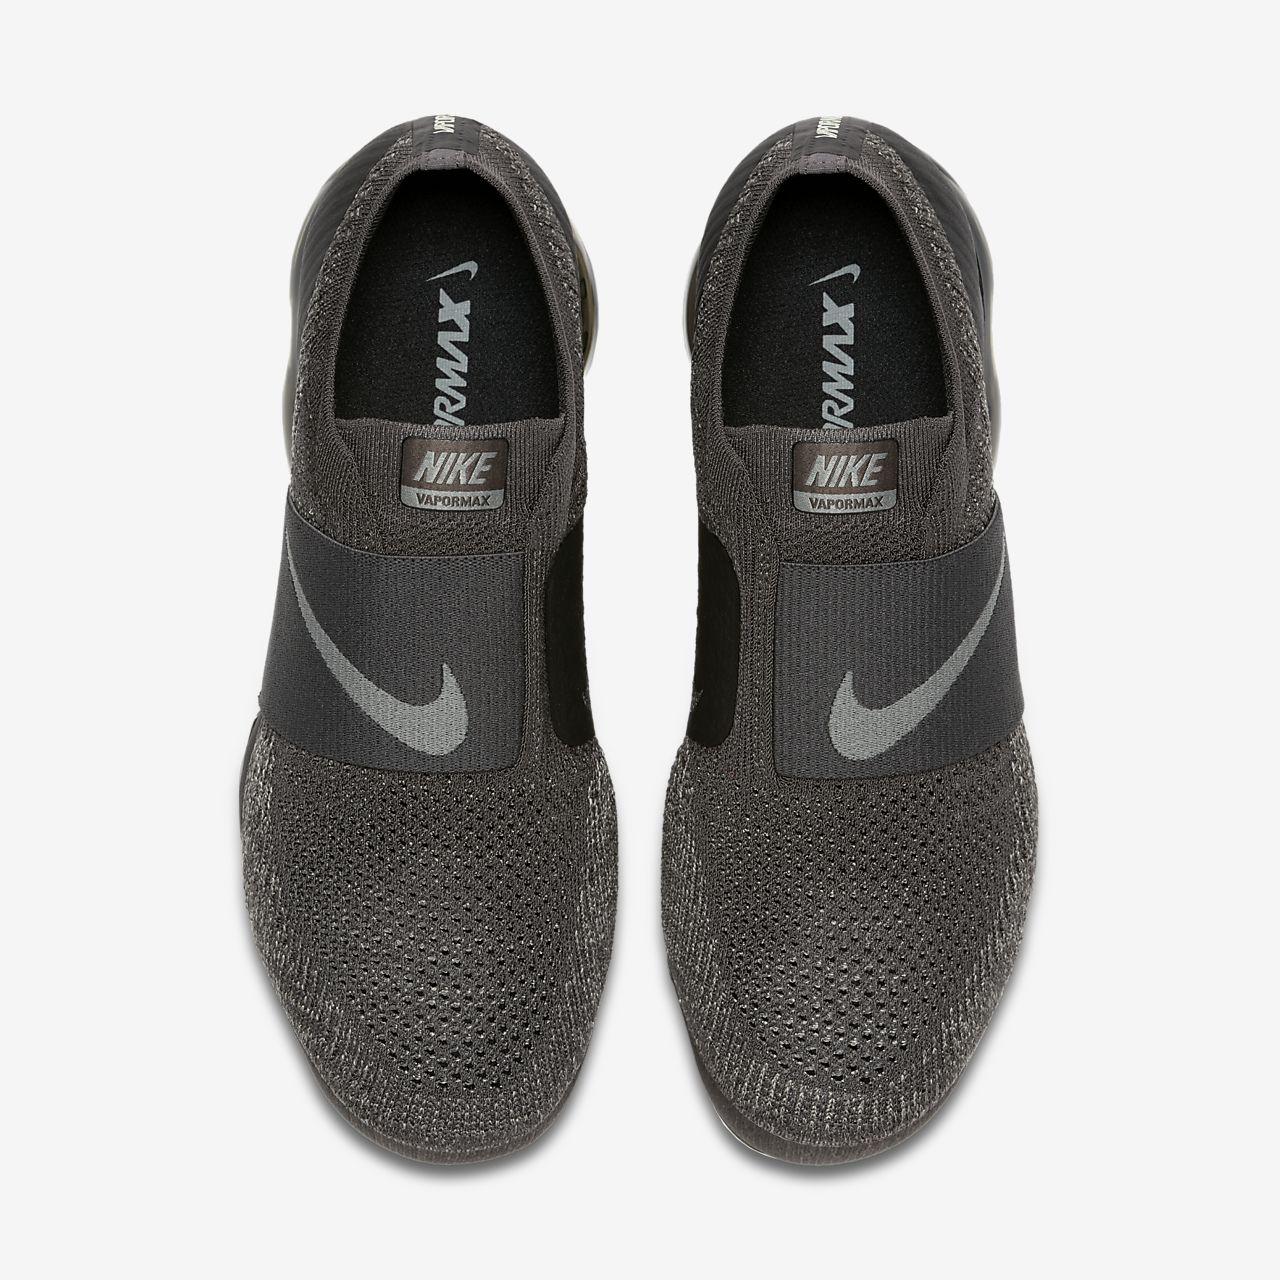 0ed19462a8c30 Nike Air VaporMax Flyknit Moc Men s Shoe. Nike.com GB